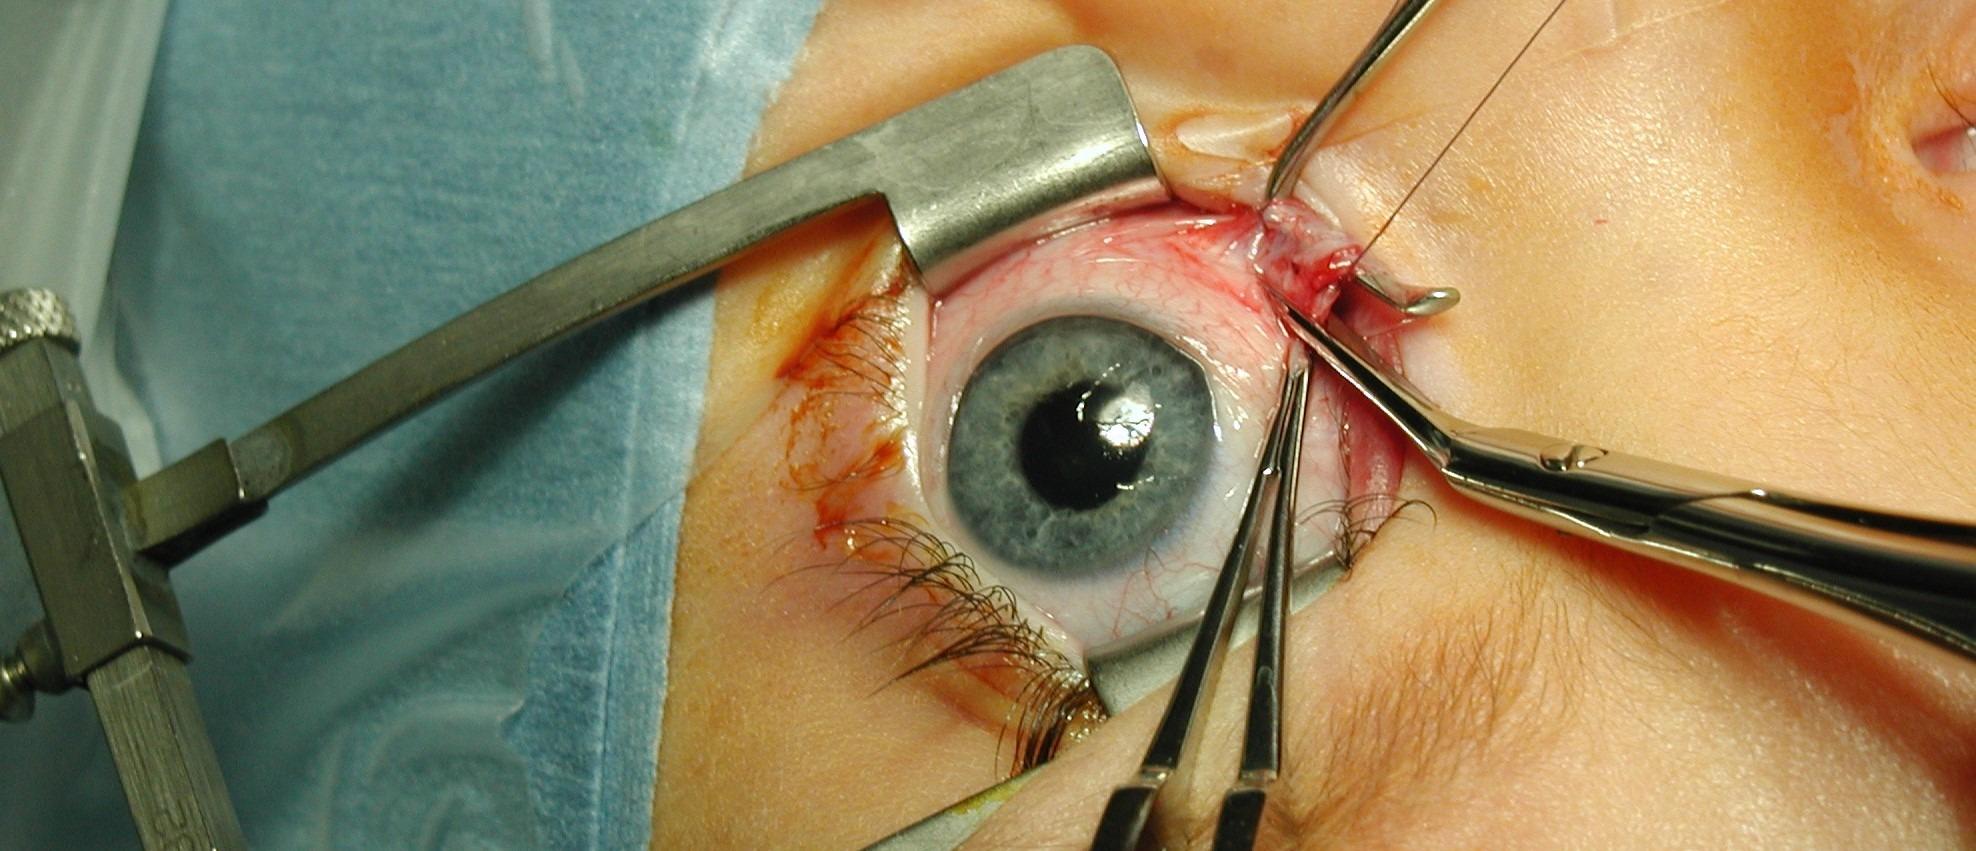 Operacja zeza